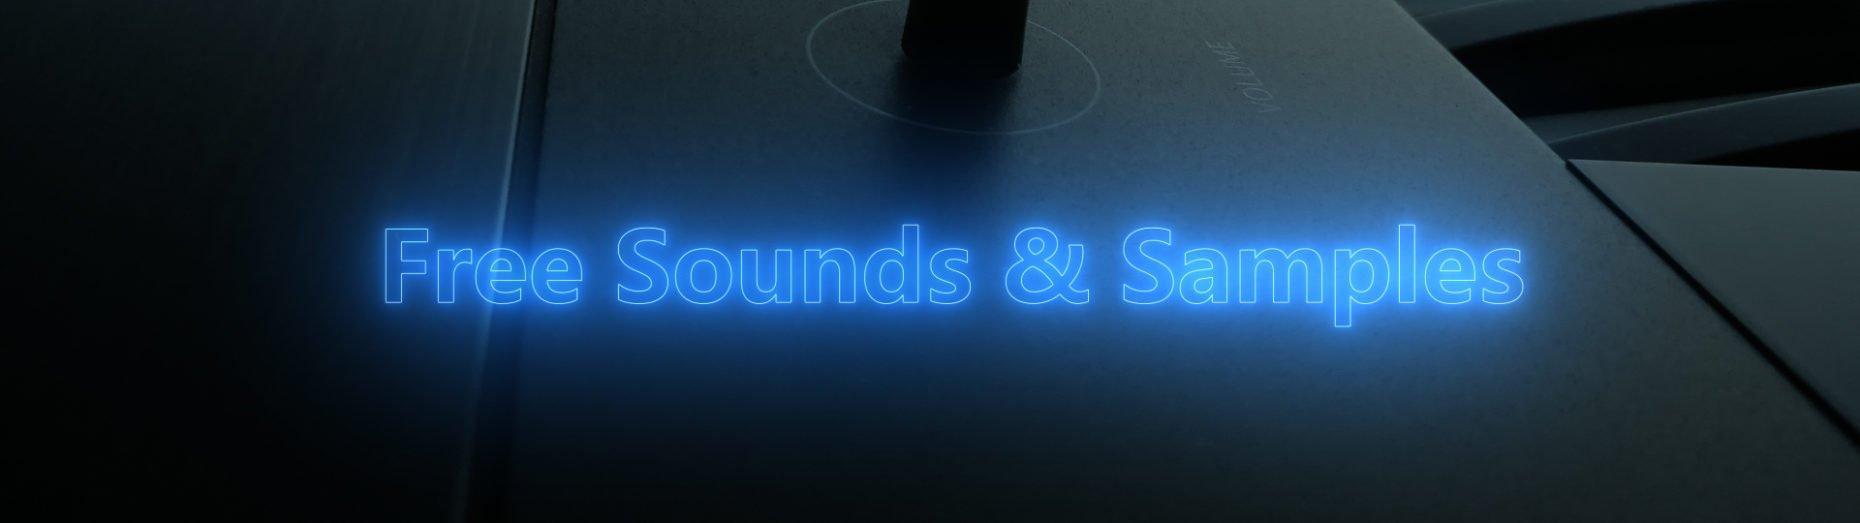 www.natlifesounds.com